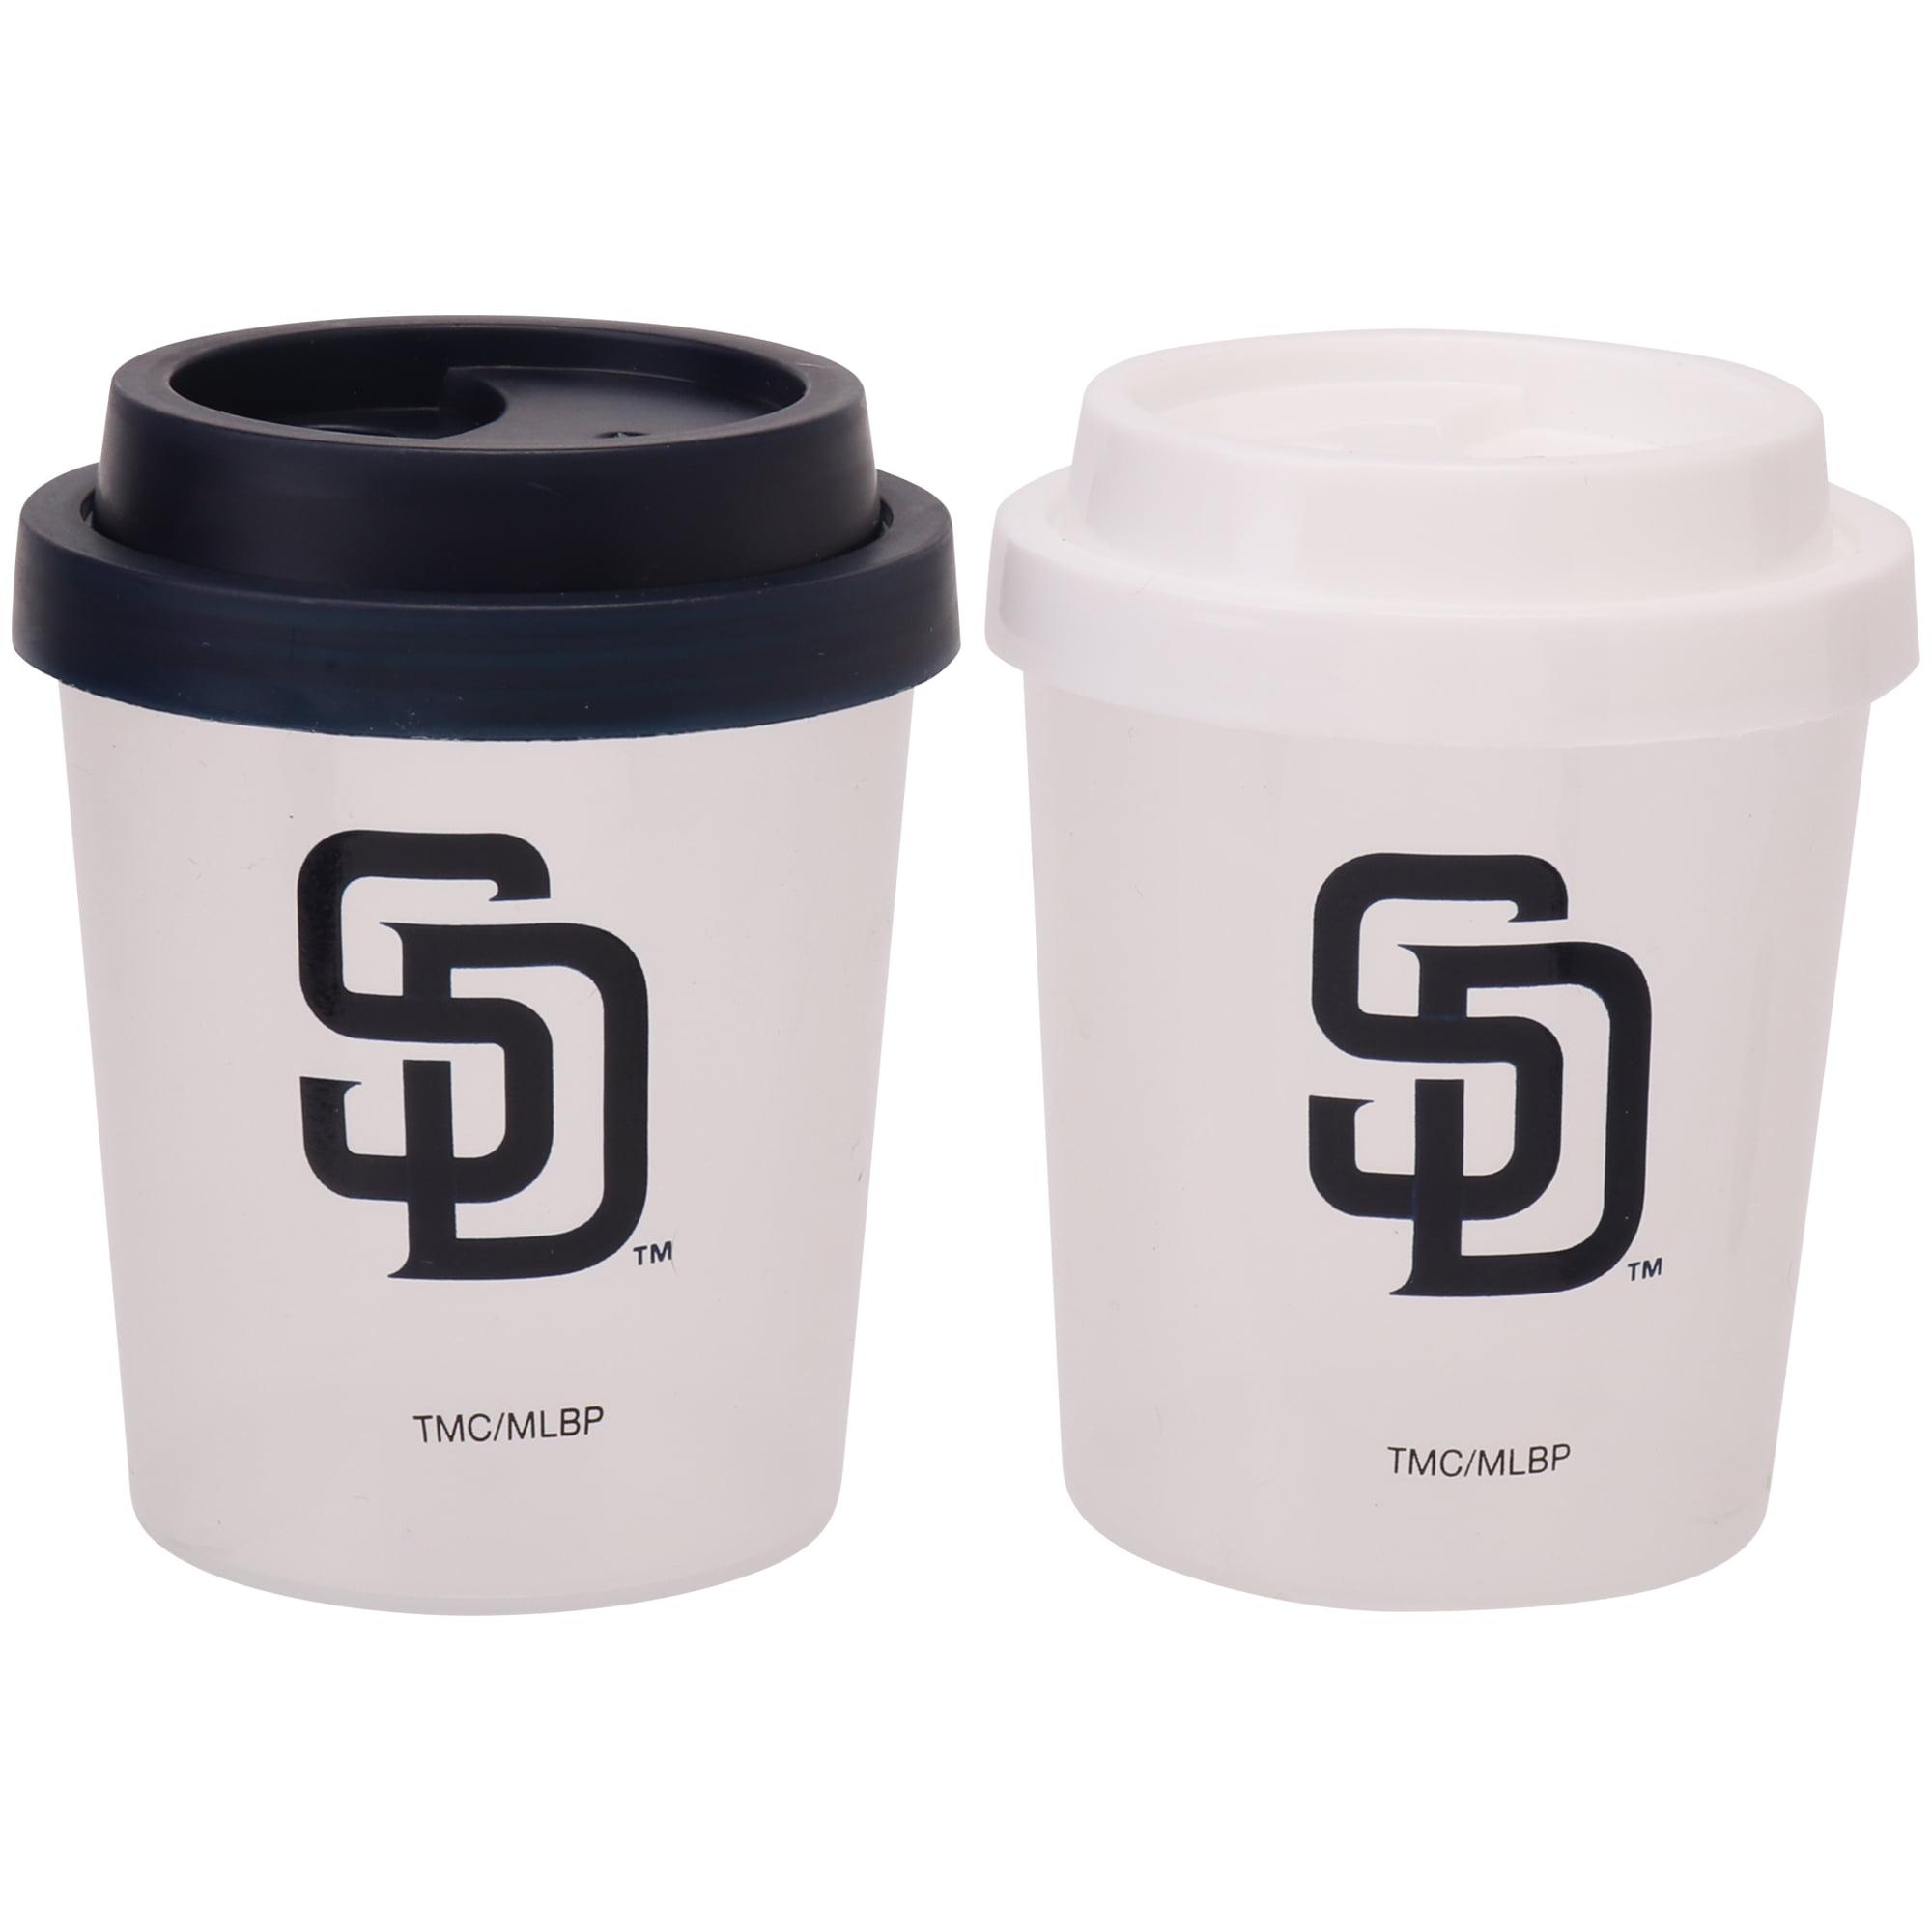 San Diego Padres Plastic Salt & Pepper Shaker - No Size